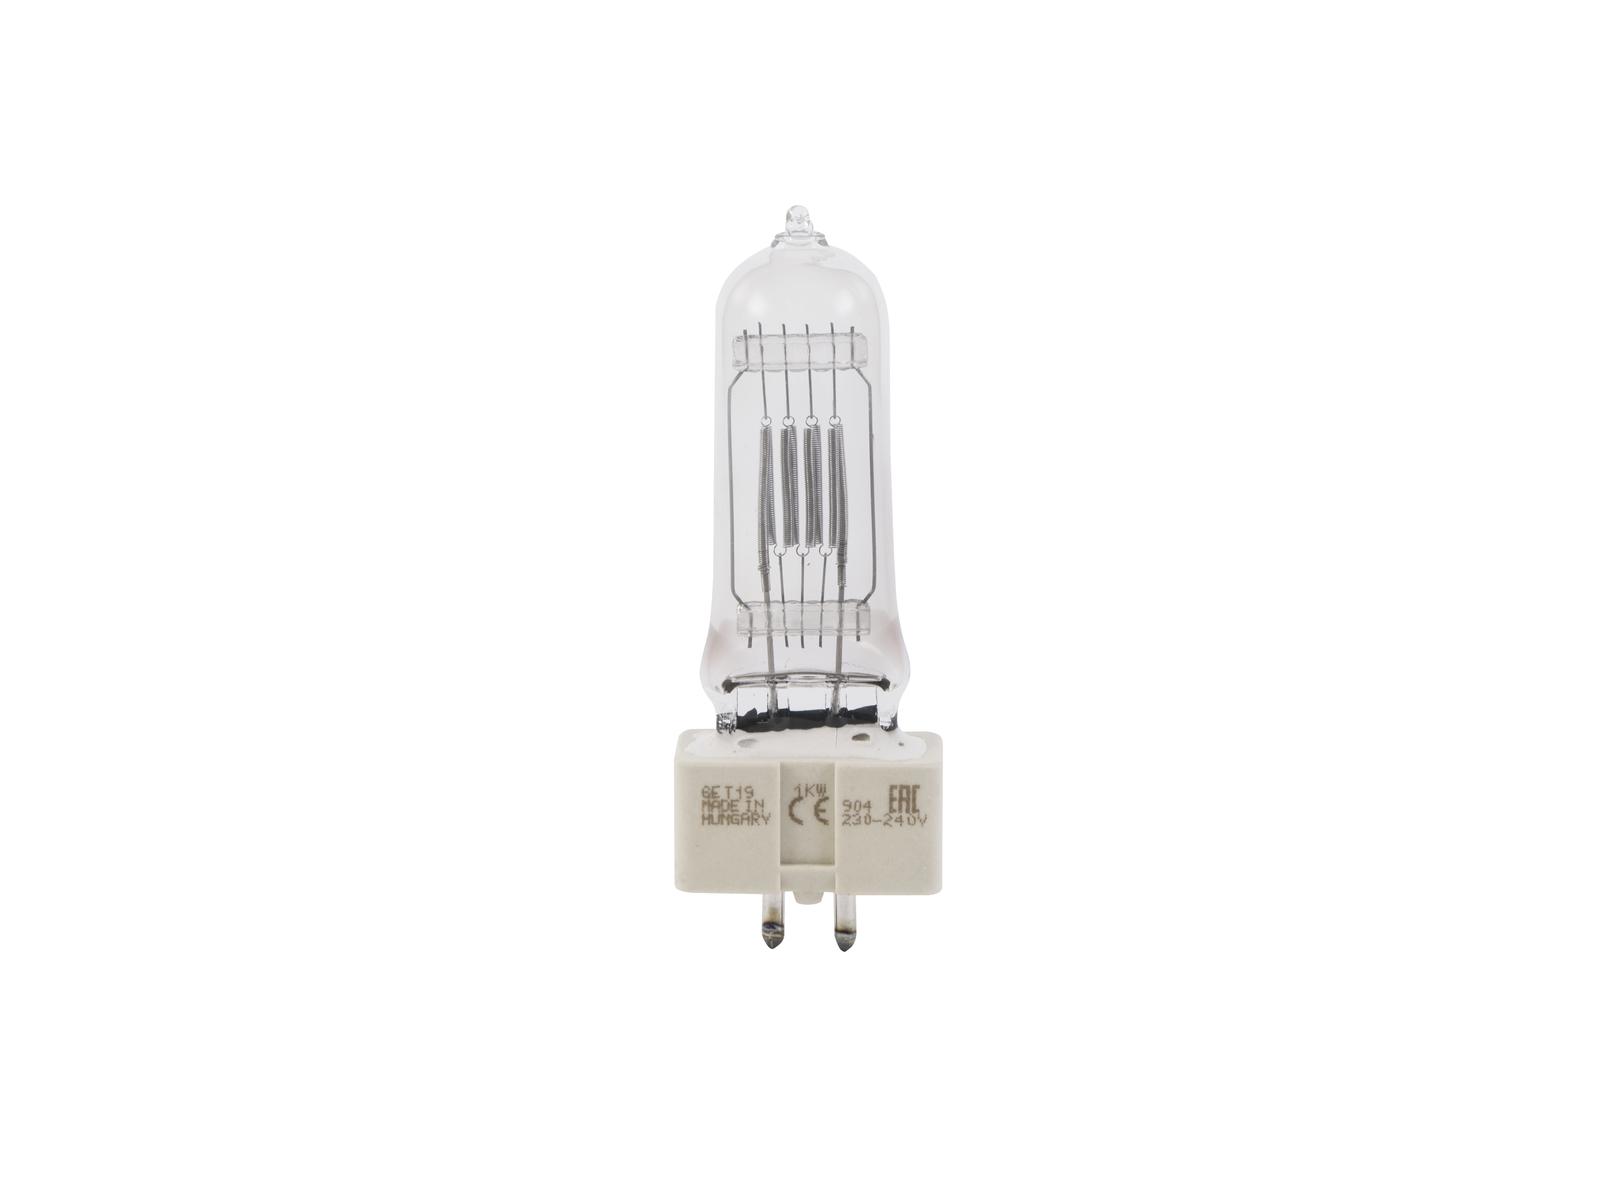 230V/1000W GX 9,5 LL T19 GE, sv. zdroj